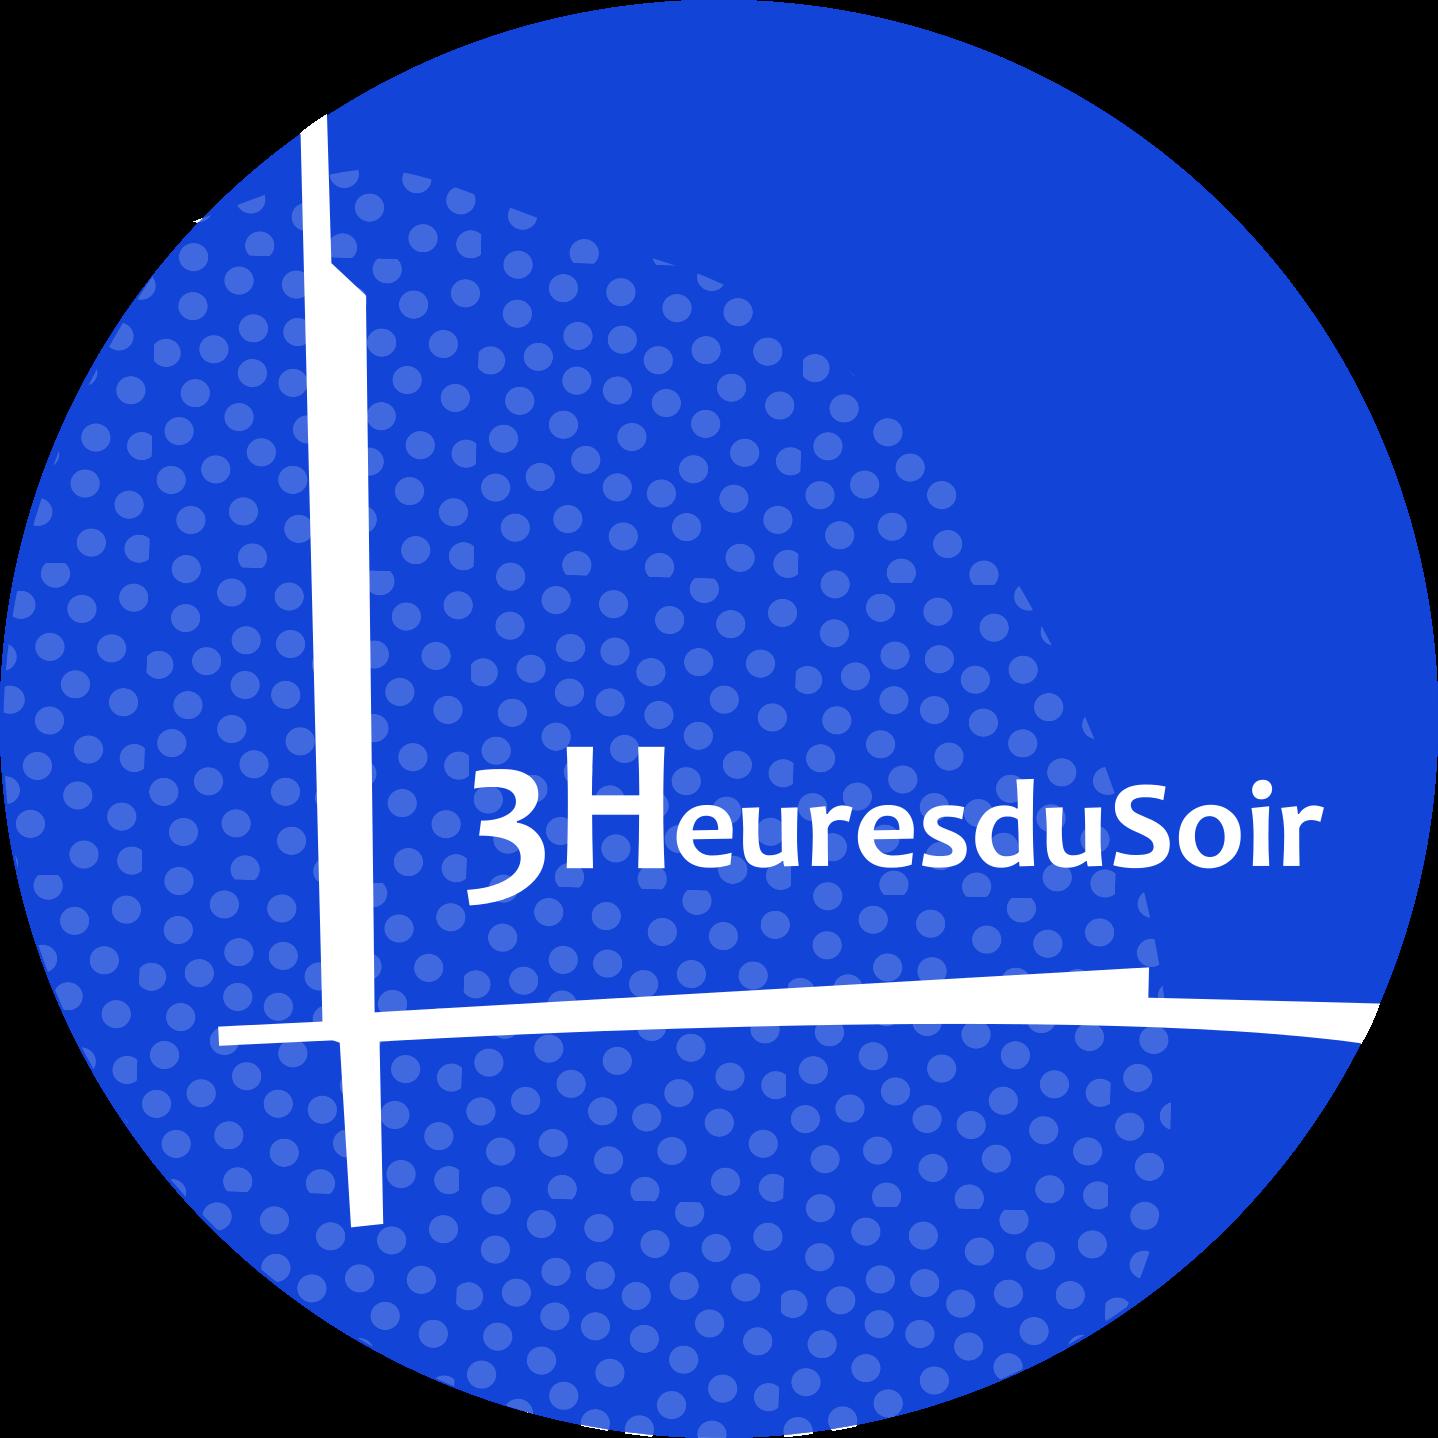 3HeuresduSoir